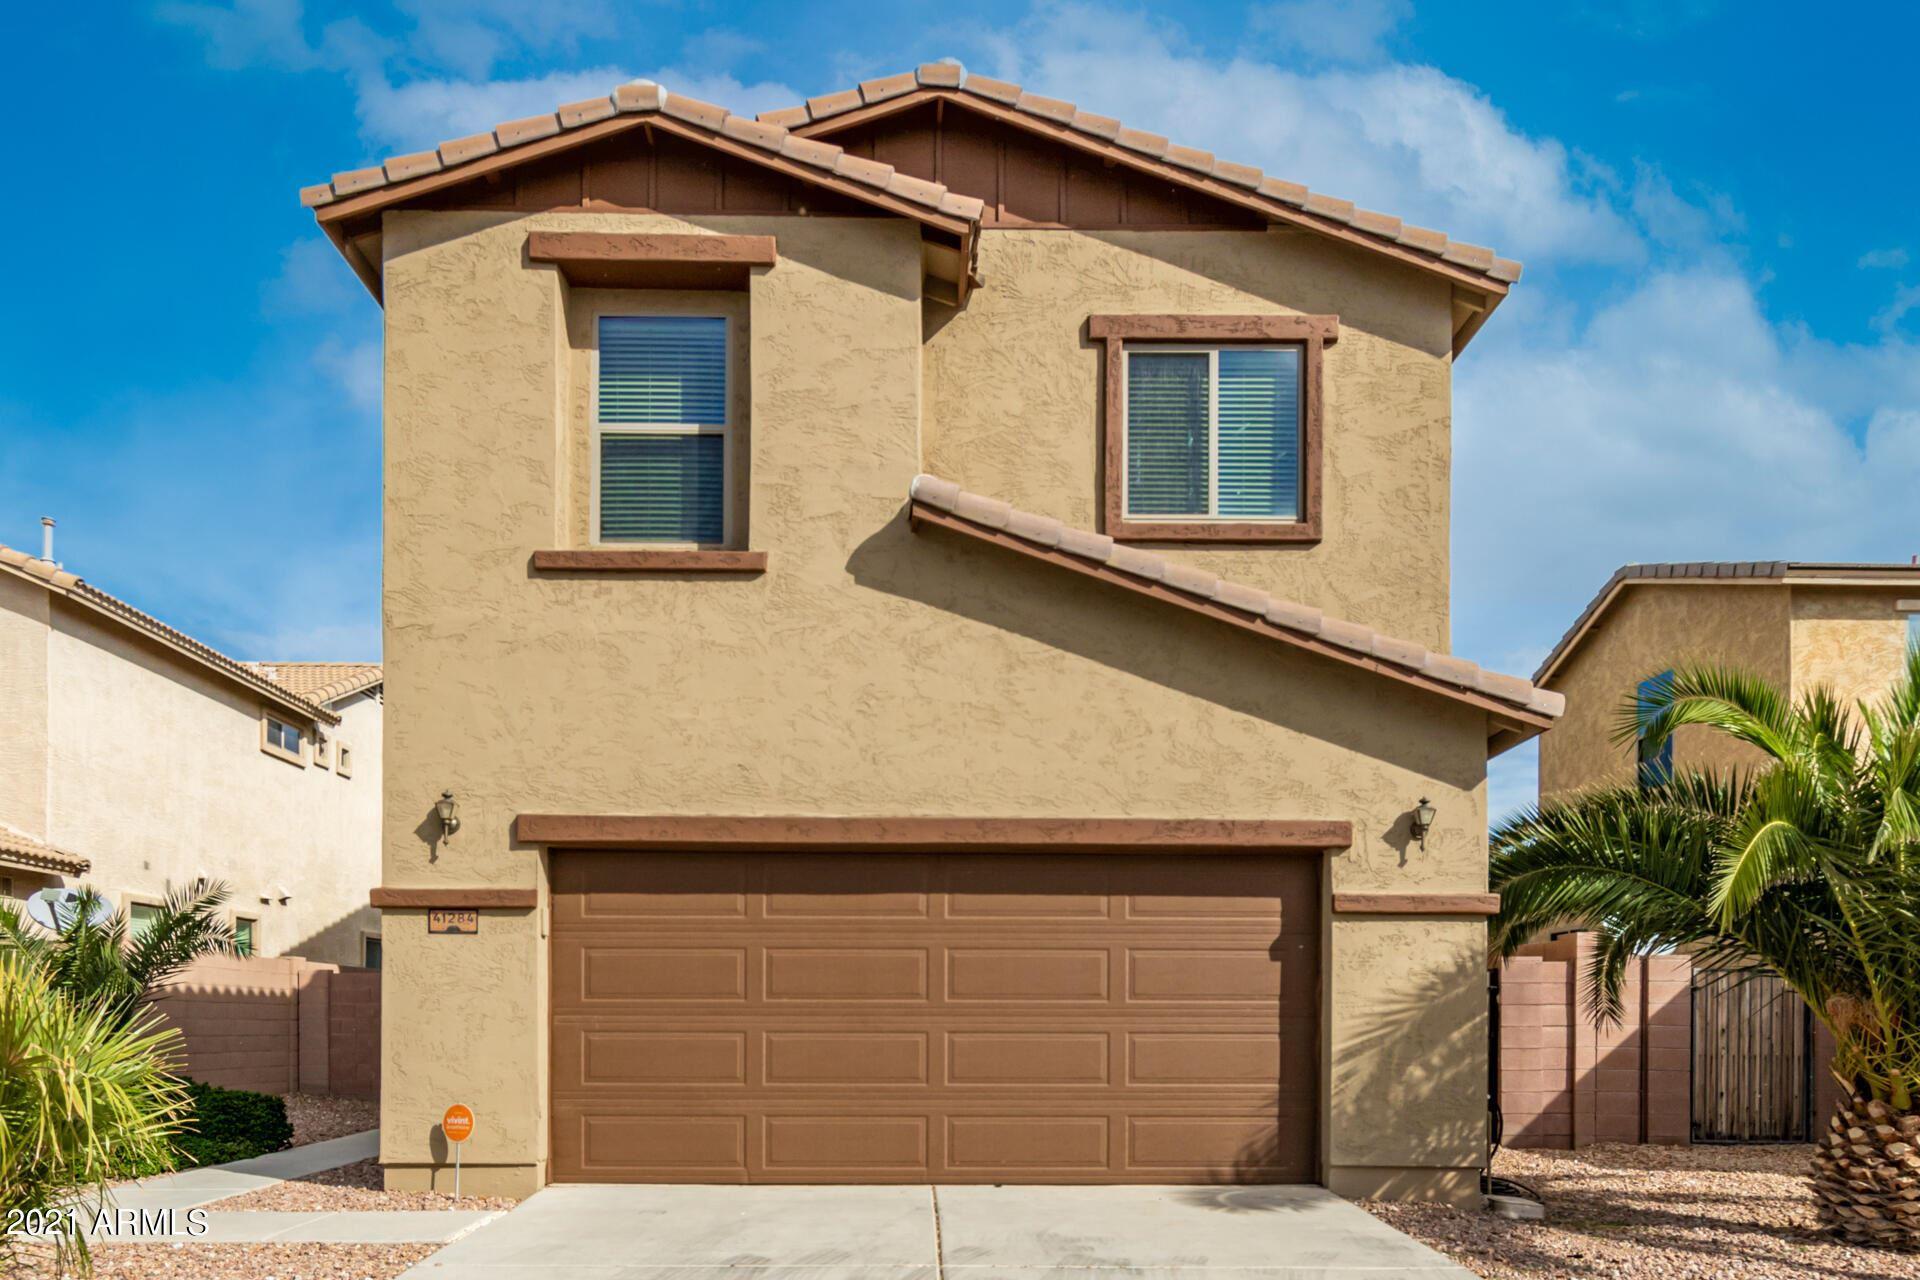 Photo for 41284 W COLBY Drive, Maricopa, AZ 85138 (MLS # 6294684)